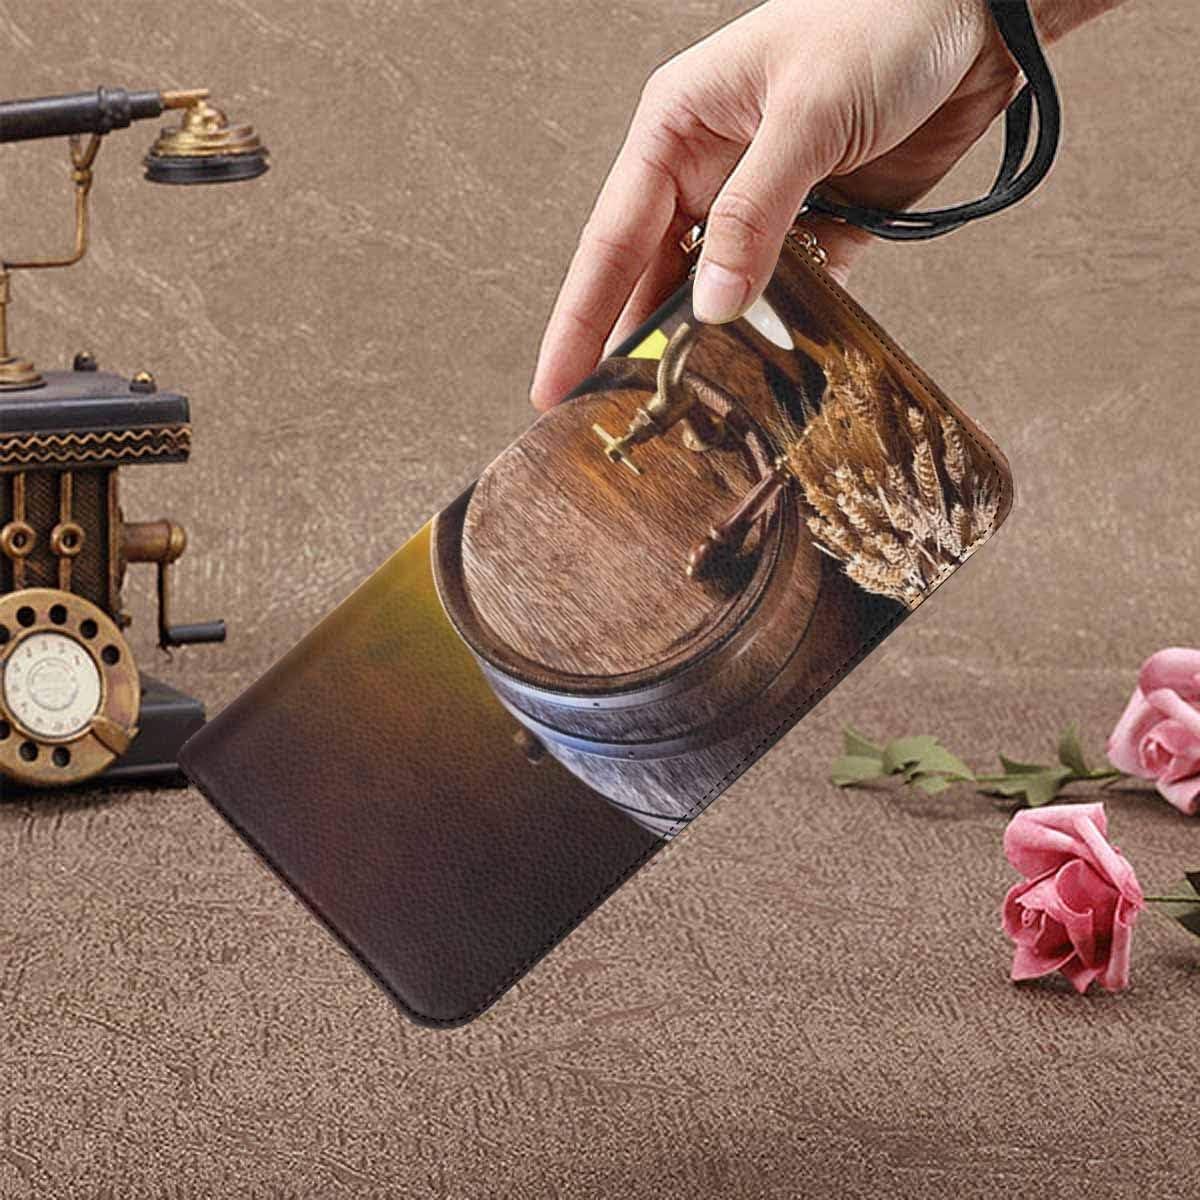 InterestPrint Funny Arts Womens Clutch Wallet Large Wristlet Zipper Clutch Large Travel Purse